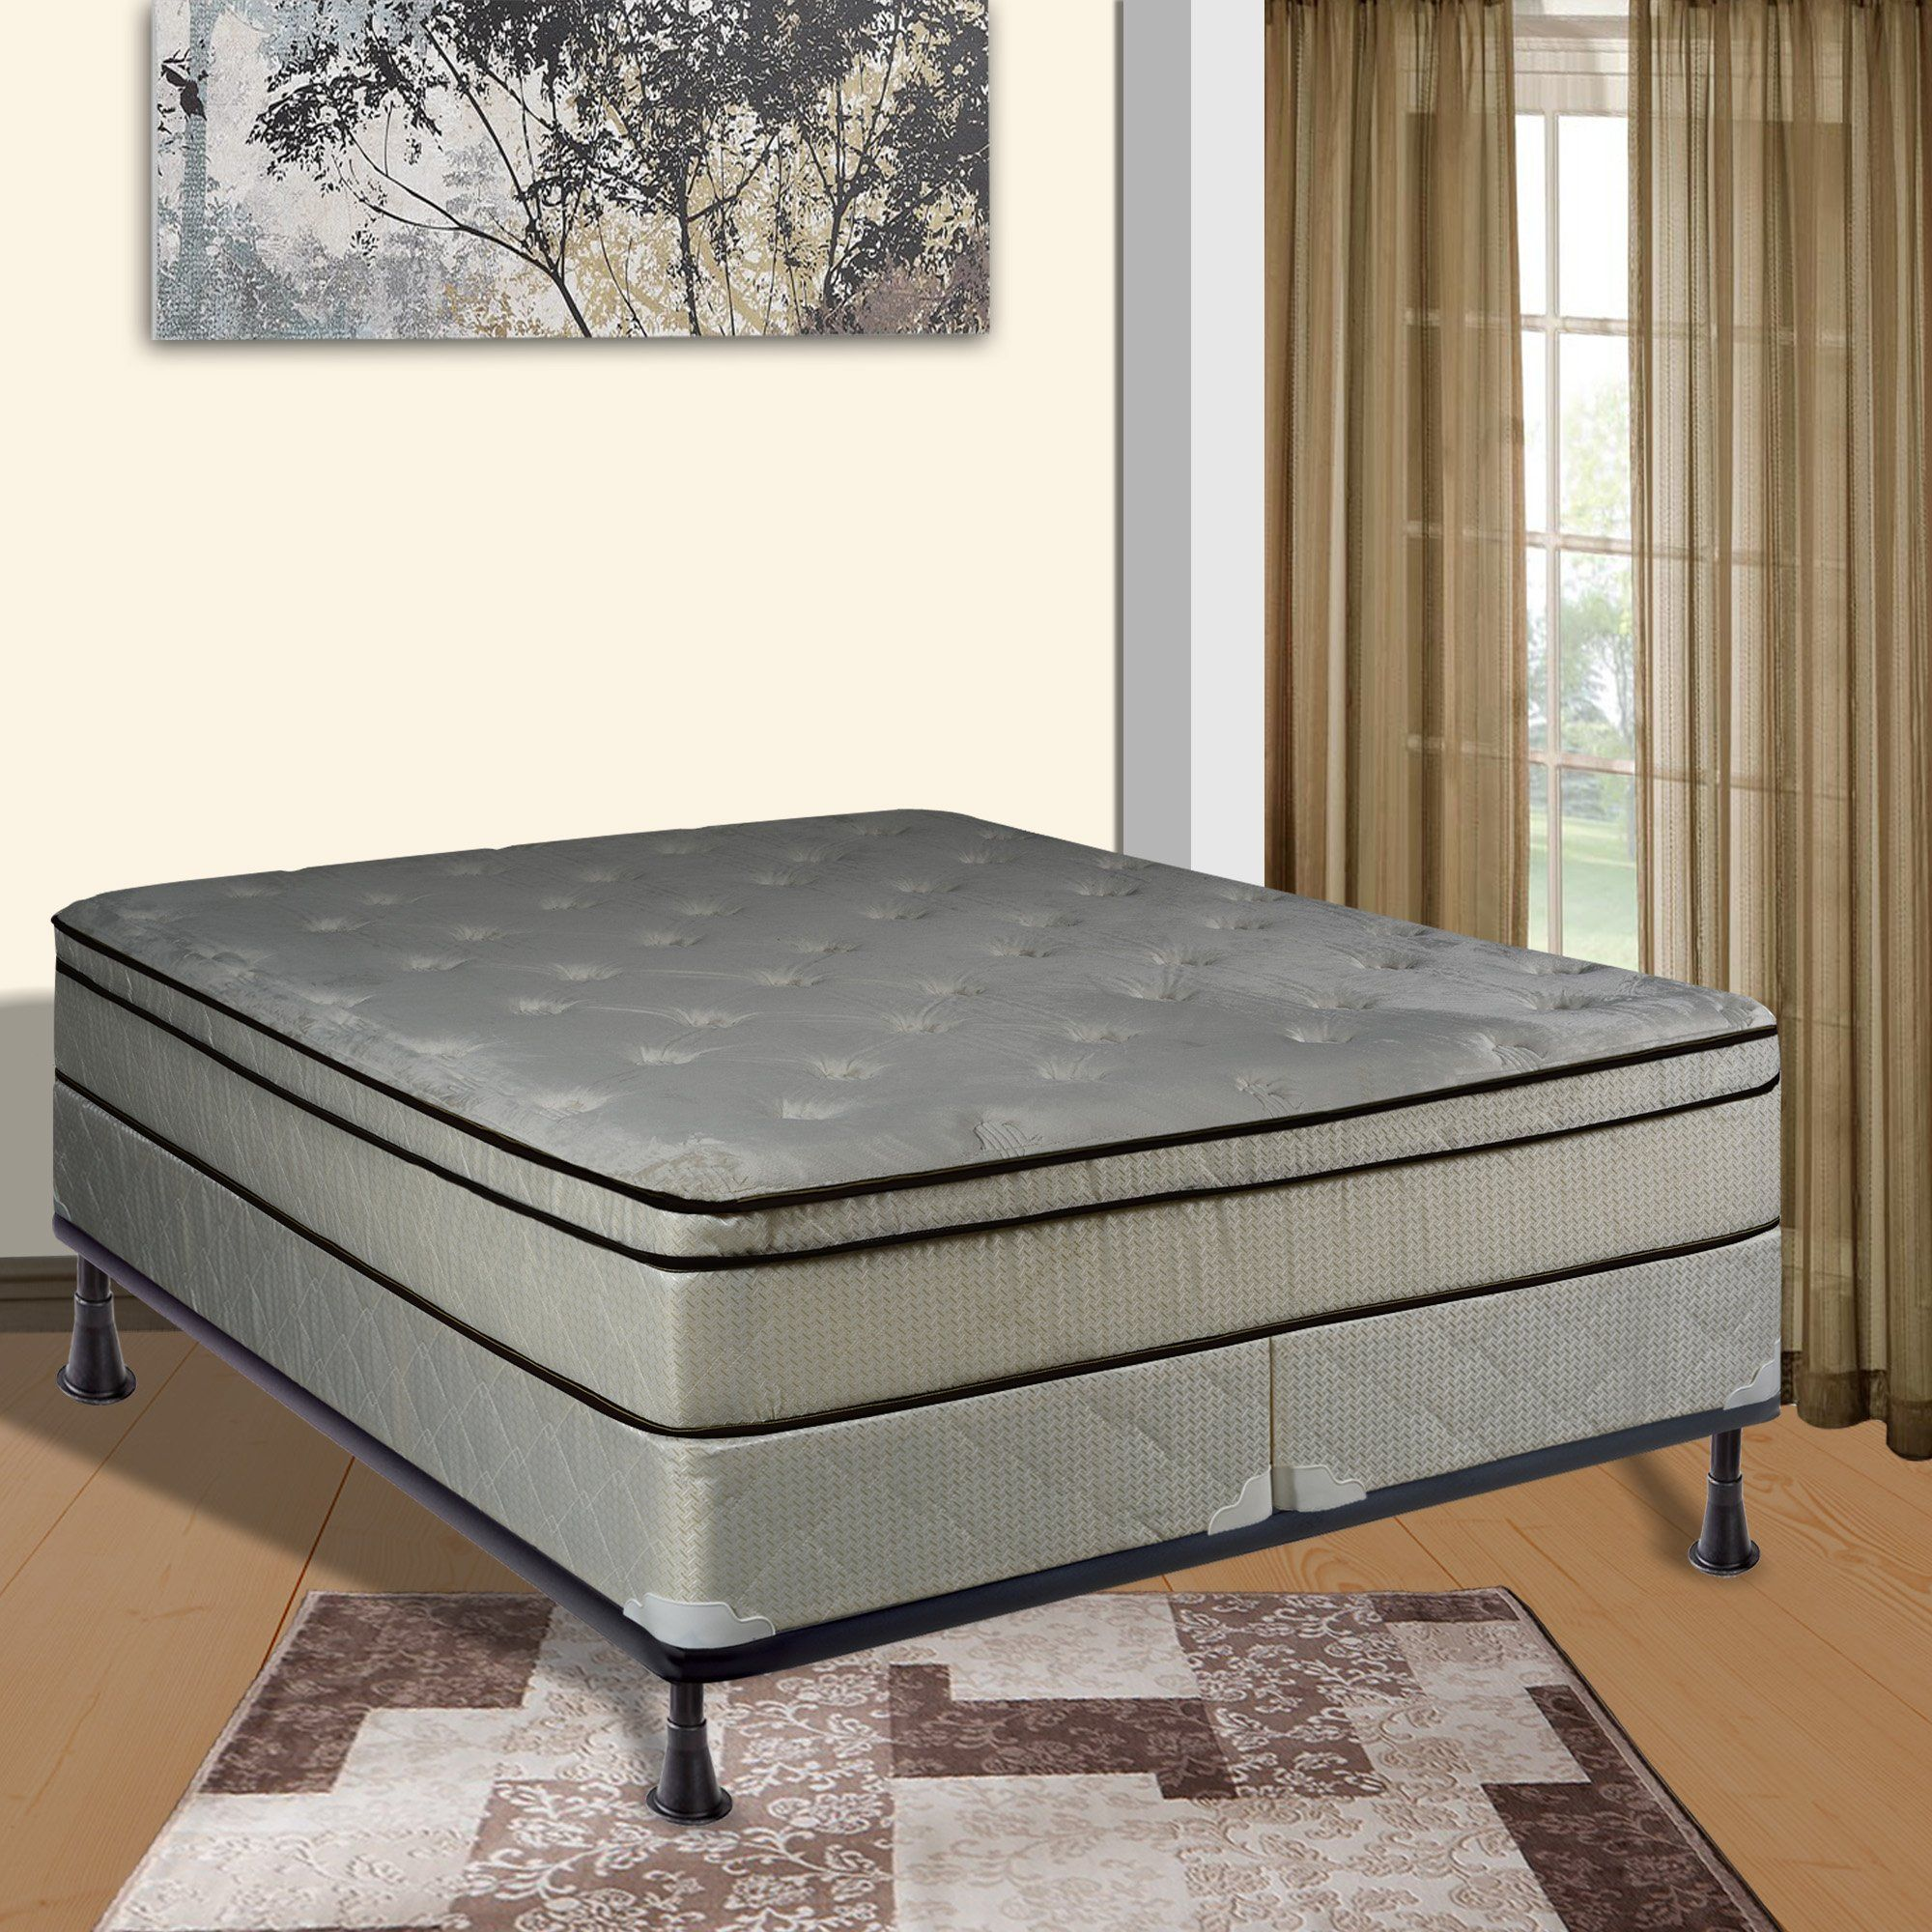 Loft bed plans for full size mattress  Continental Sleep Mattress  Inch Euro Top Assembled  Orthopedic